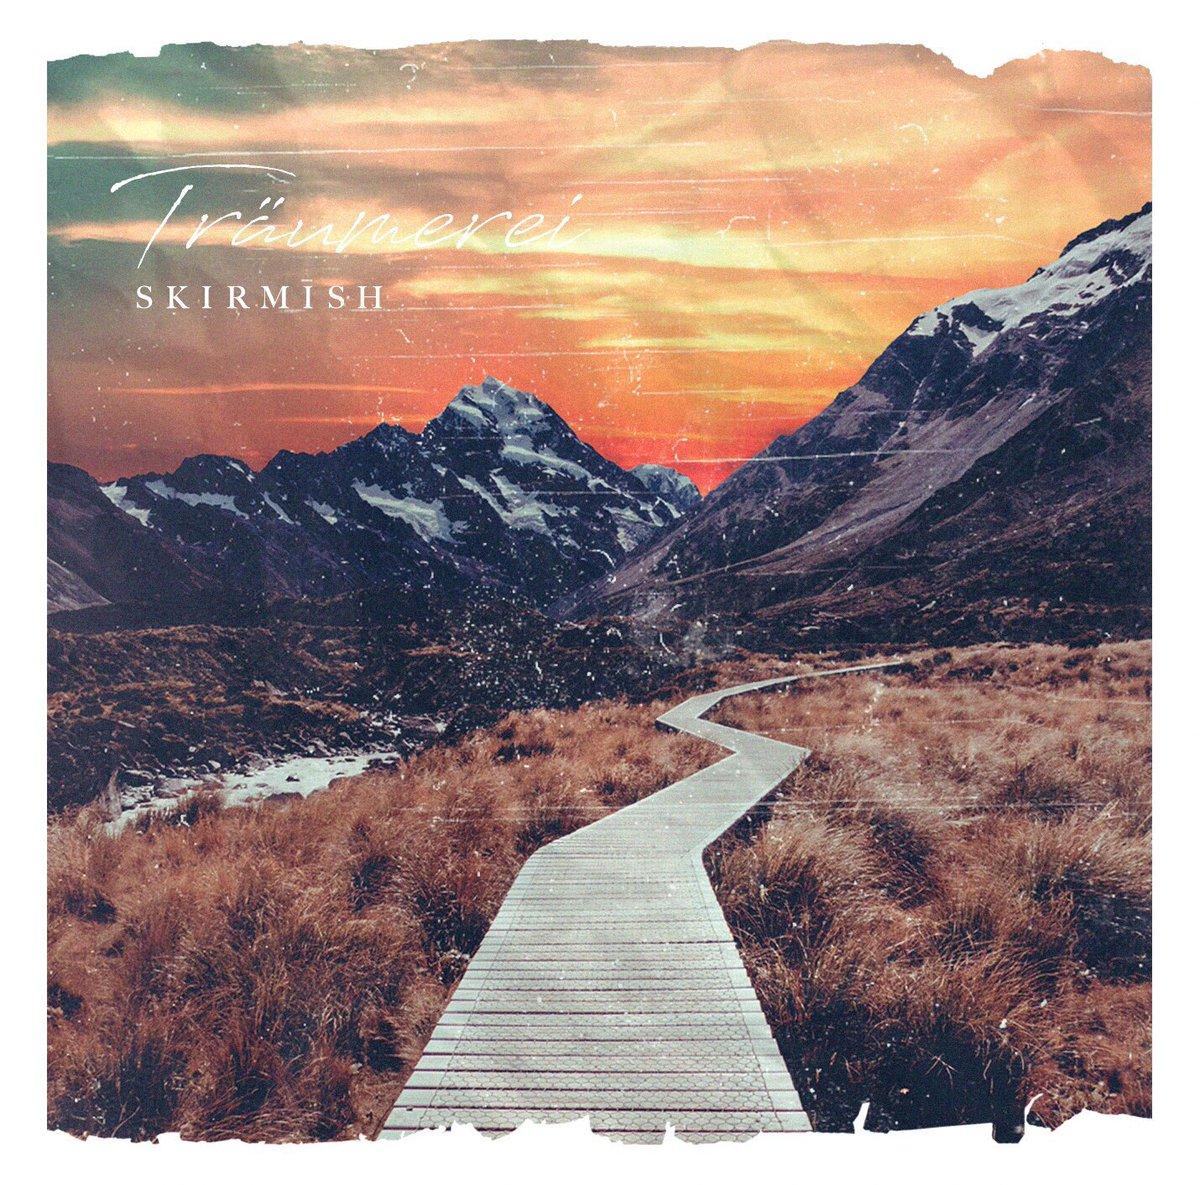 [SKIRMISH 楽曲販売💿]SKIRMISH Mini Album「Träumerei」(トロイメライ) 物販にてCD発売中 + オンライン配信中!「Träumerei」M1 トロイメライM2 Way of lifeM3 プラチナM4 深海M5 マイルストーン